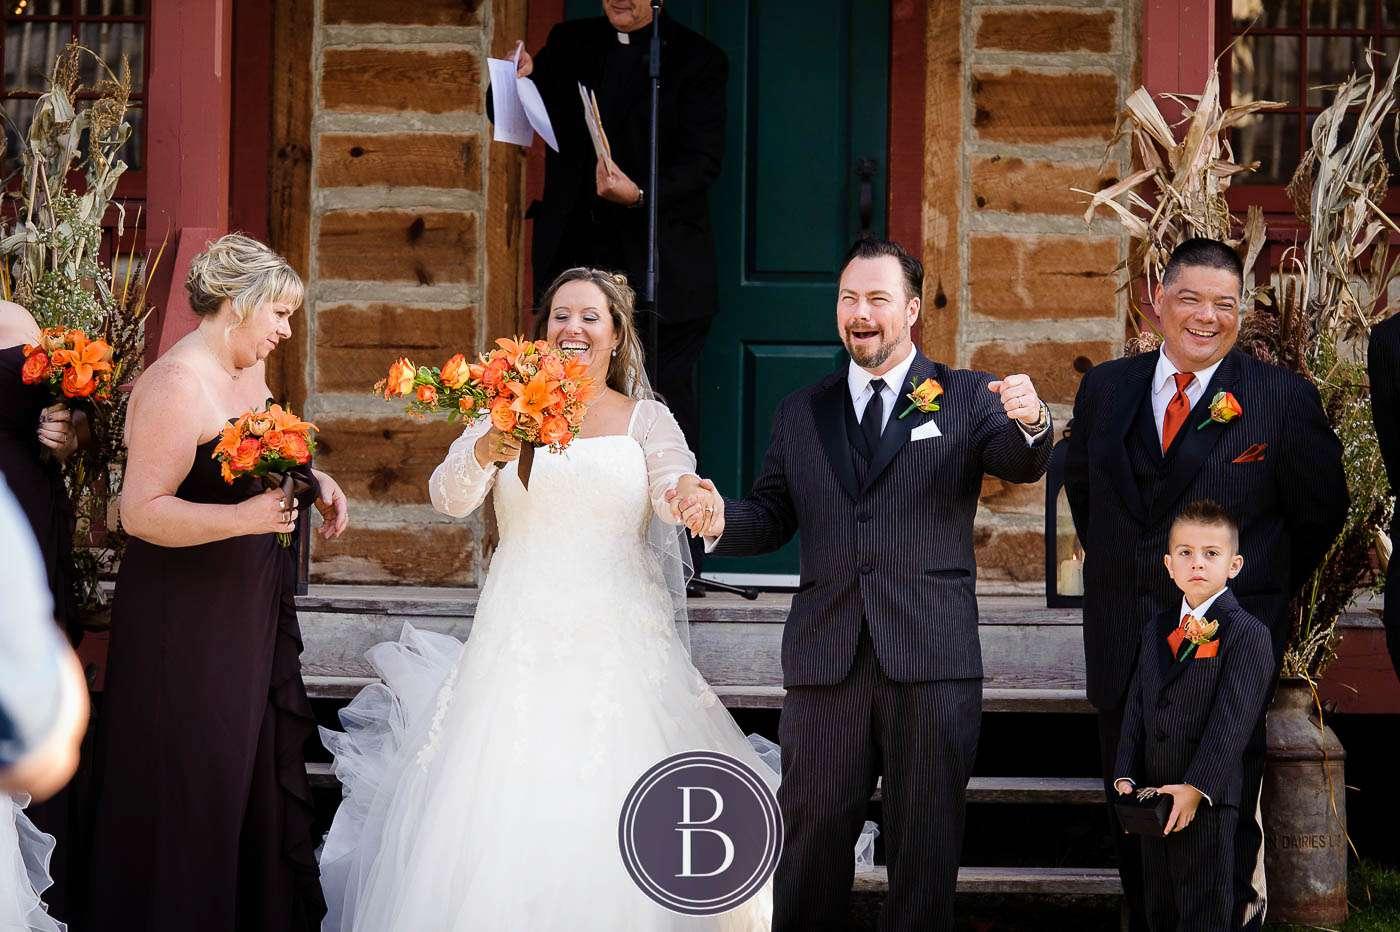 Fort Gibraltar wedding ceremony bride and groom smiles